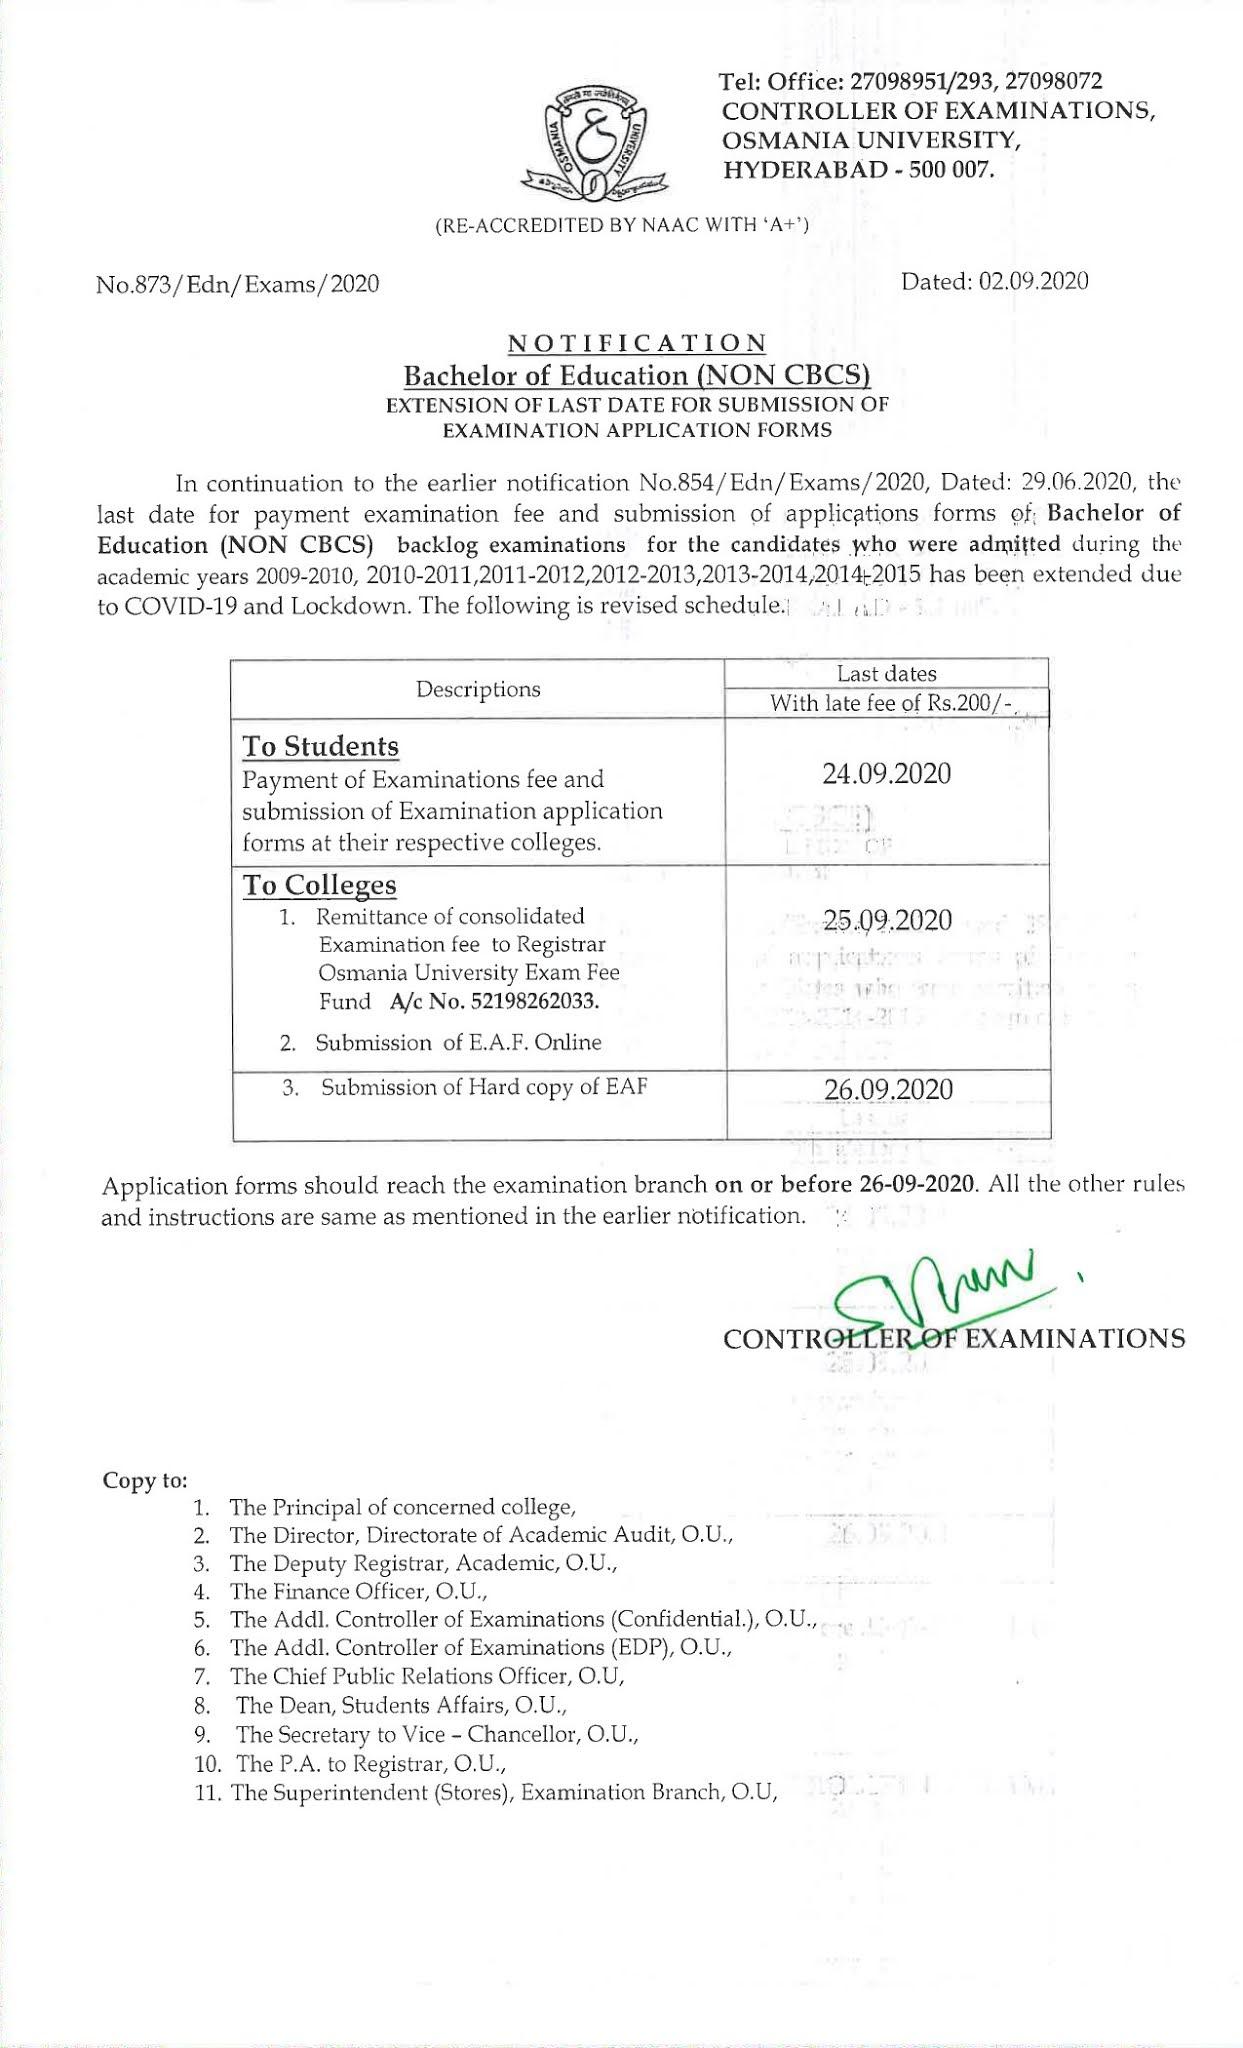 Osmania University B.Ed (Non CBCS) Backlog Sep 2020 Exam Fee Notification